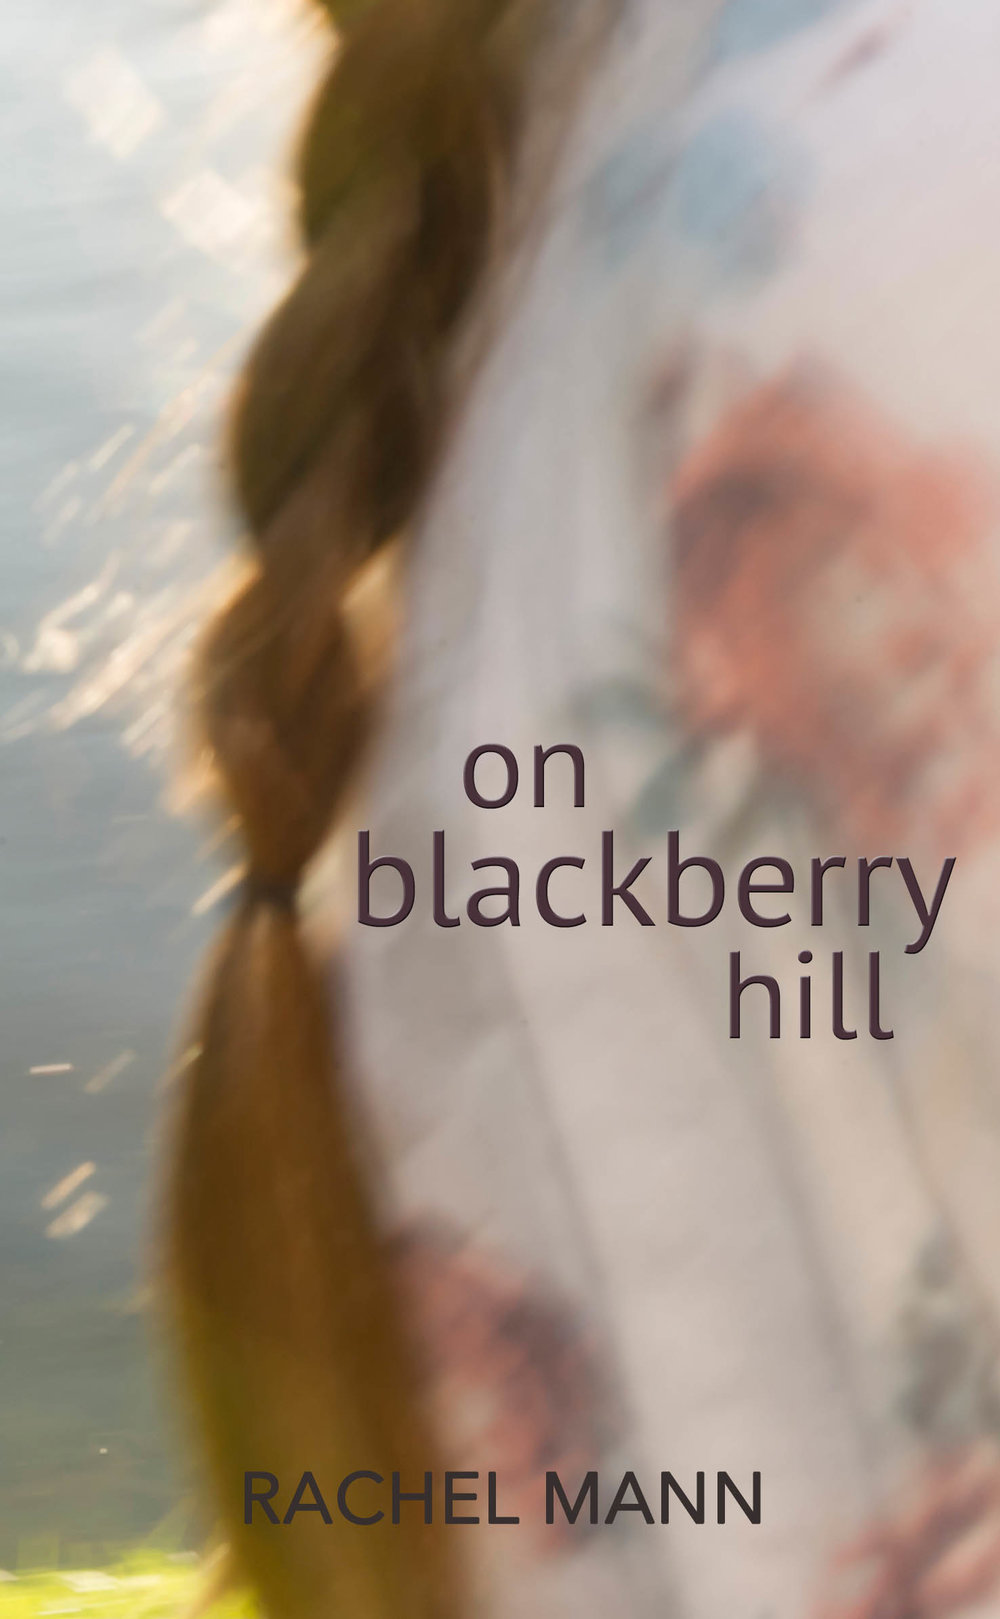 On-Blackberry-Hill-rachel-mann.jpeg